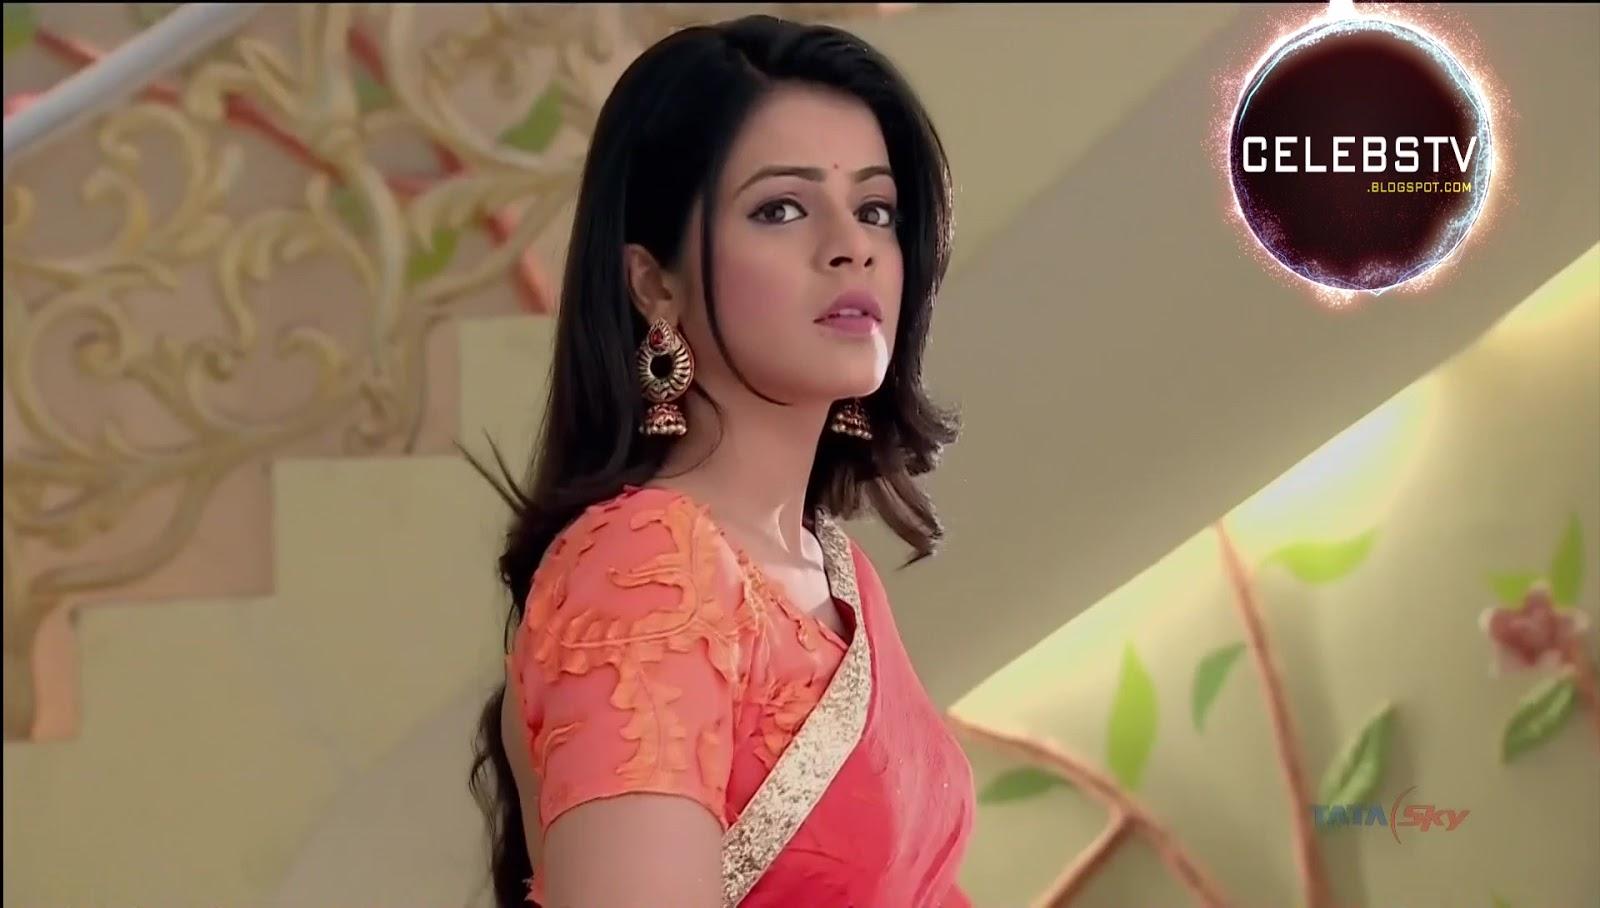 Watch Jigyasa Singh 2014 video